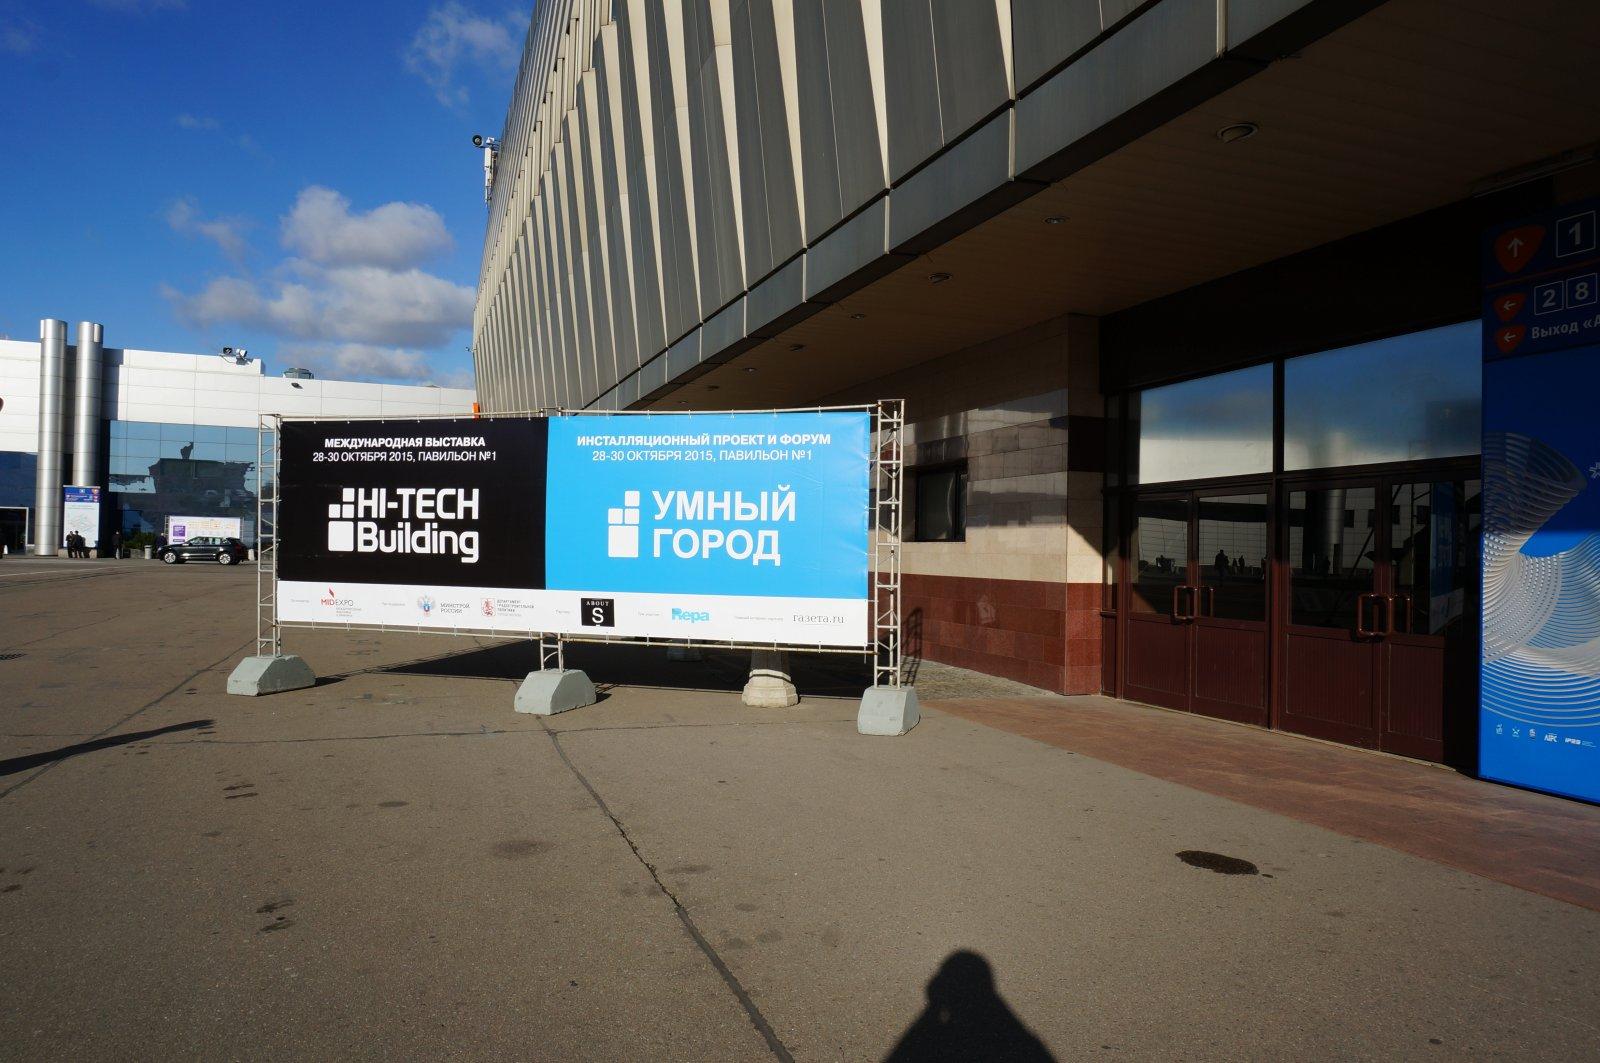 Объединённая площадка RIW и HI-TECH Building / Integrated Systems Russia